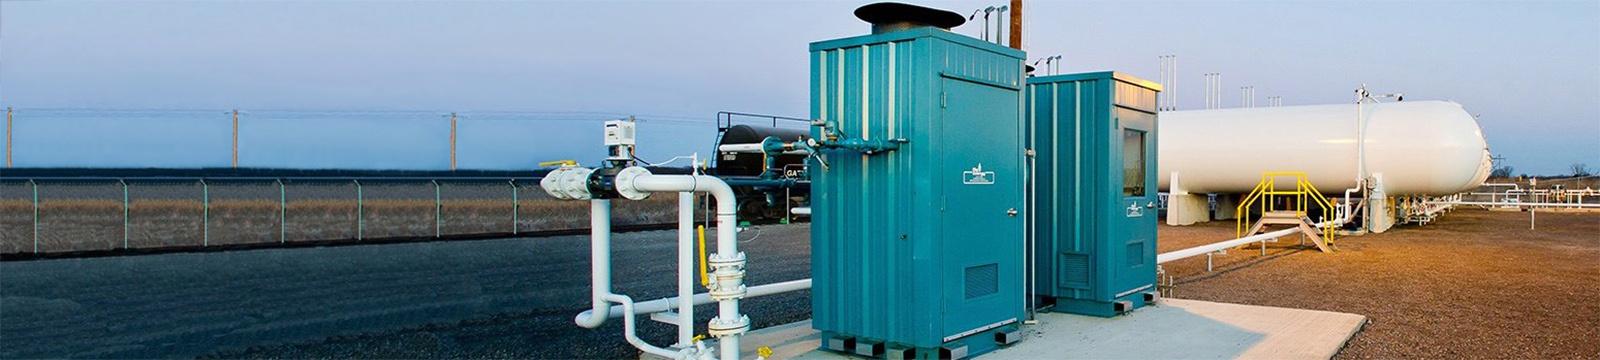 LPG Propane Water Bath Vaporizers_2.jpg